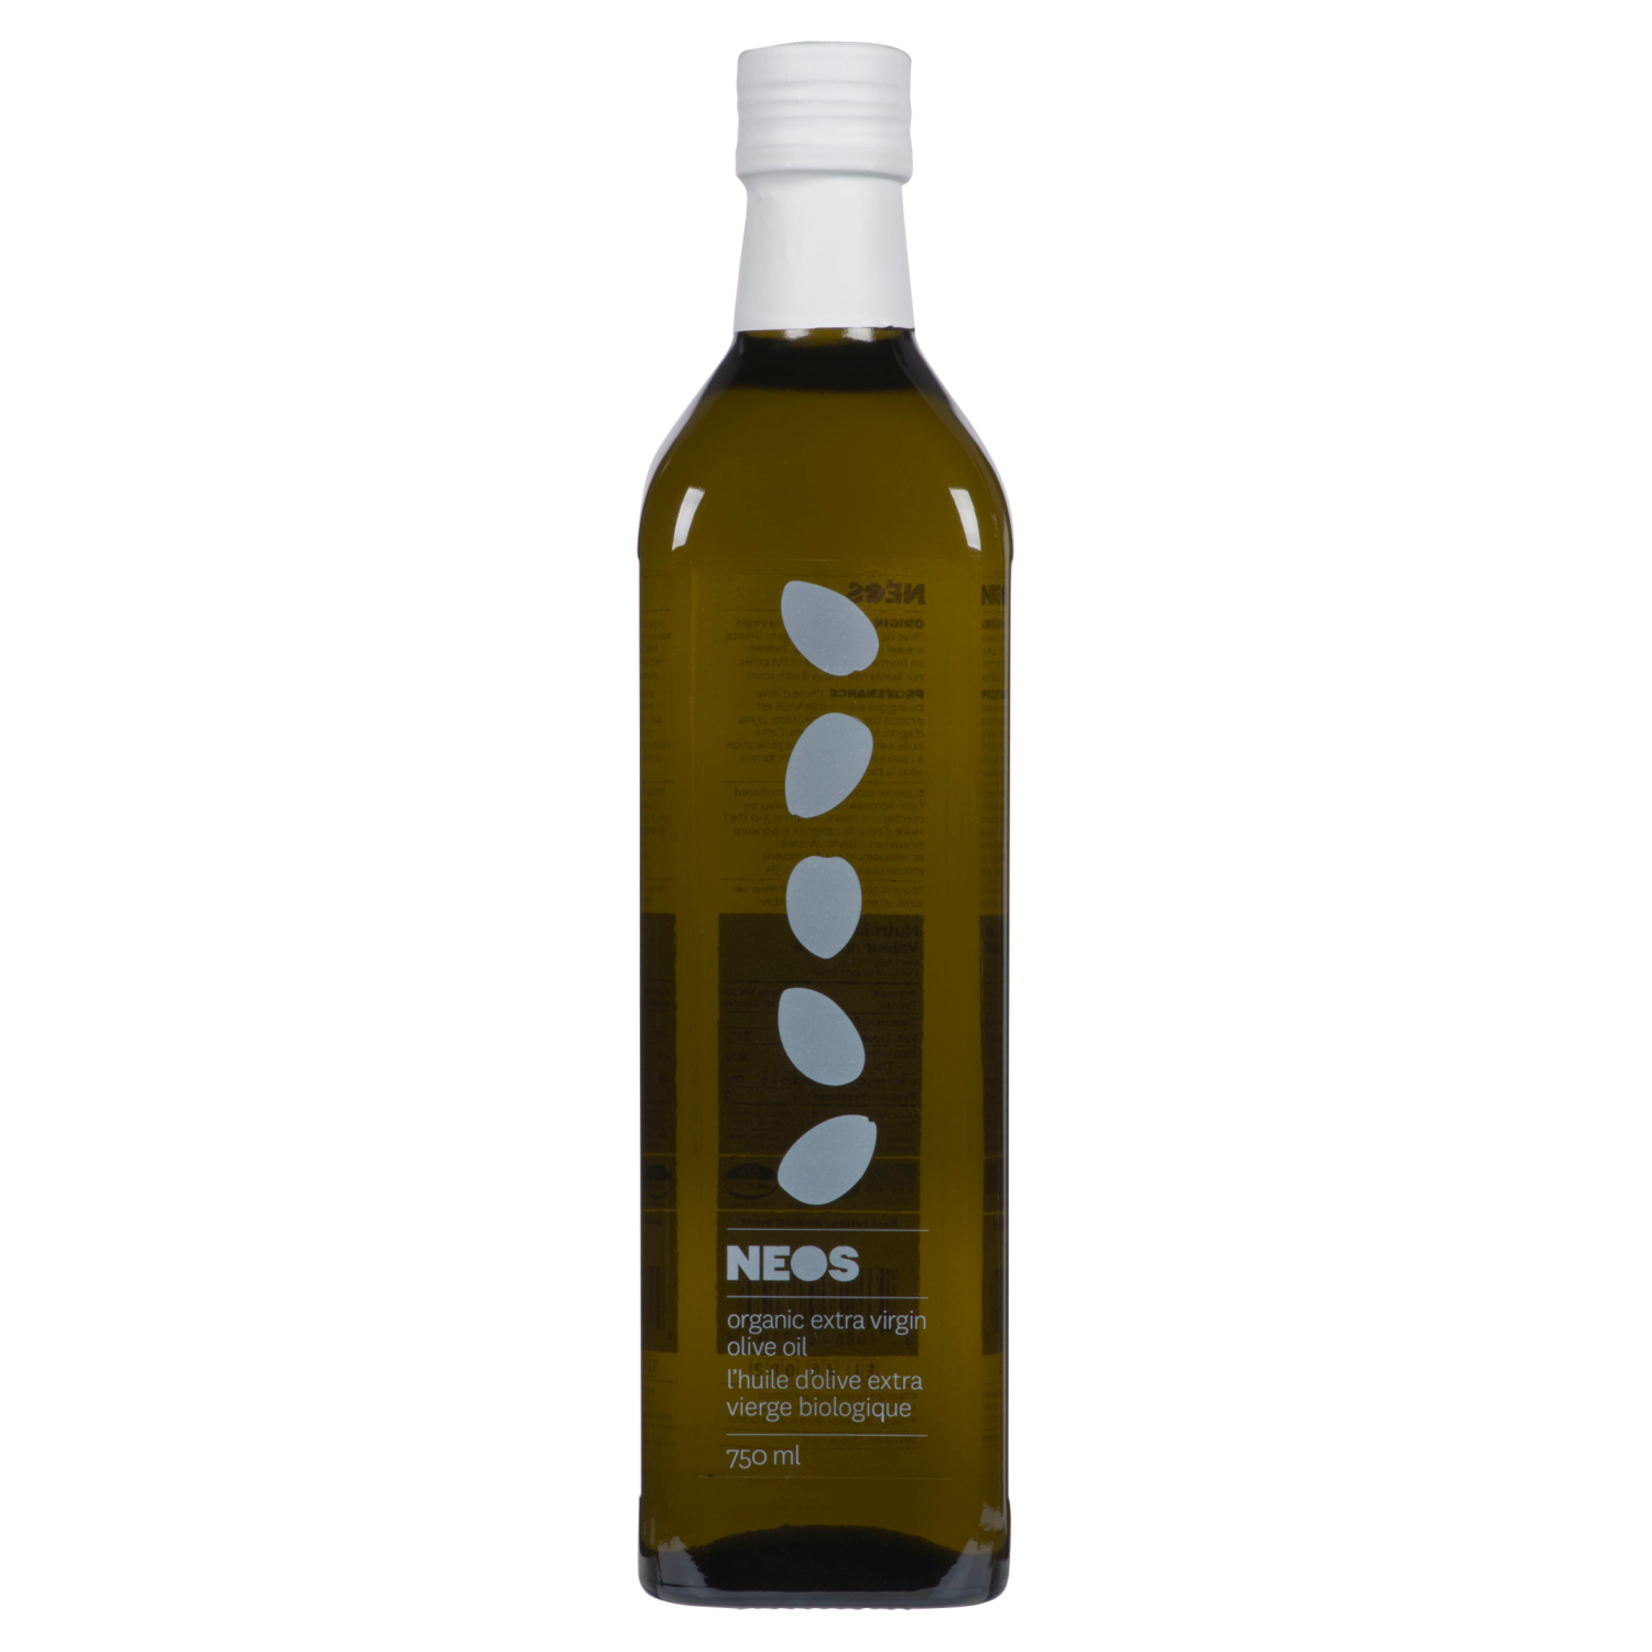 Neos Organic Extra Virgin Olive Oil 750ml